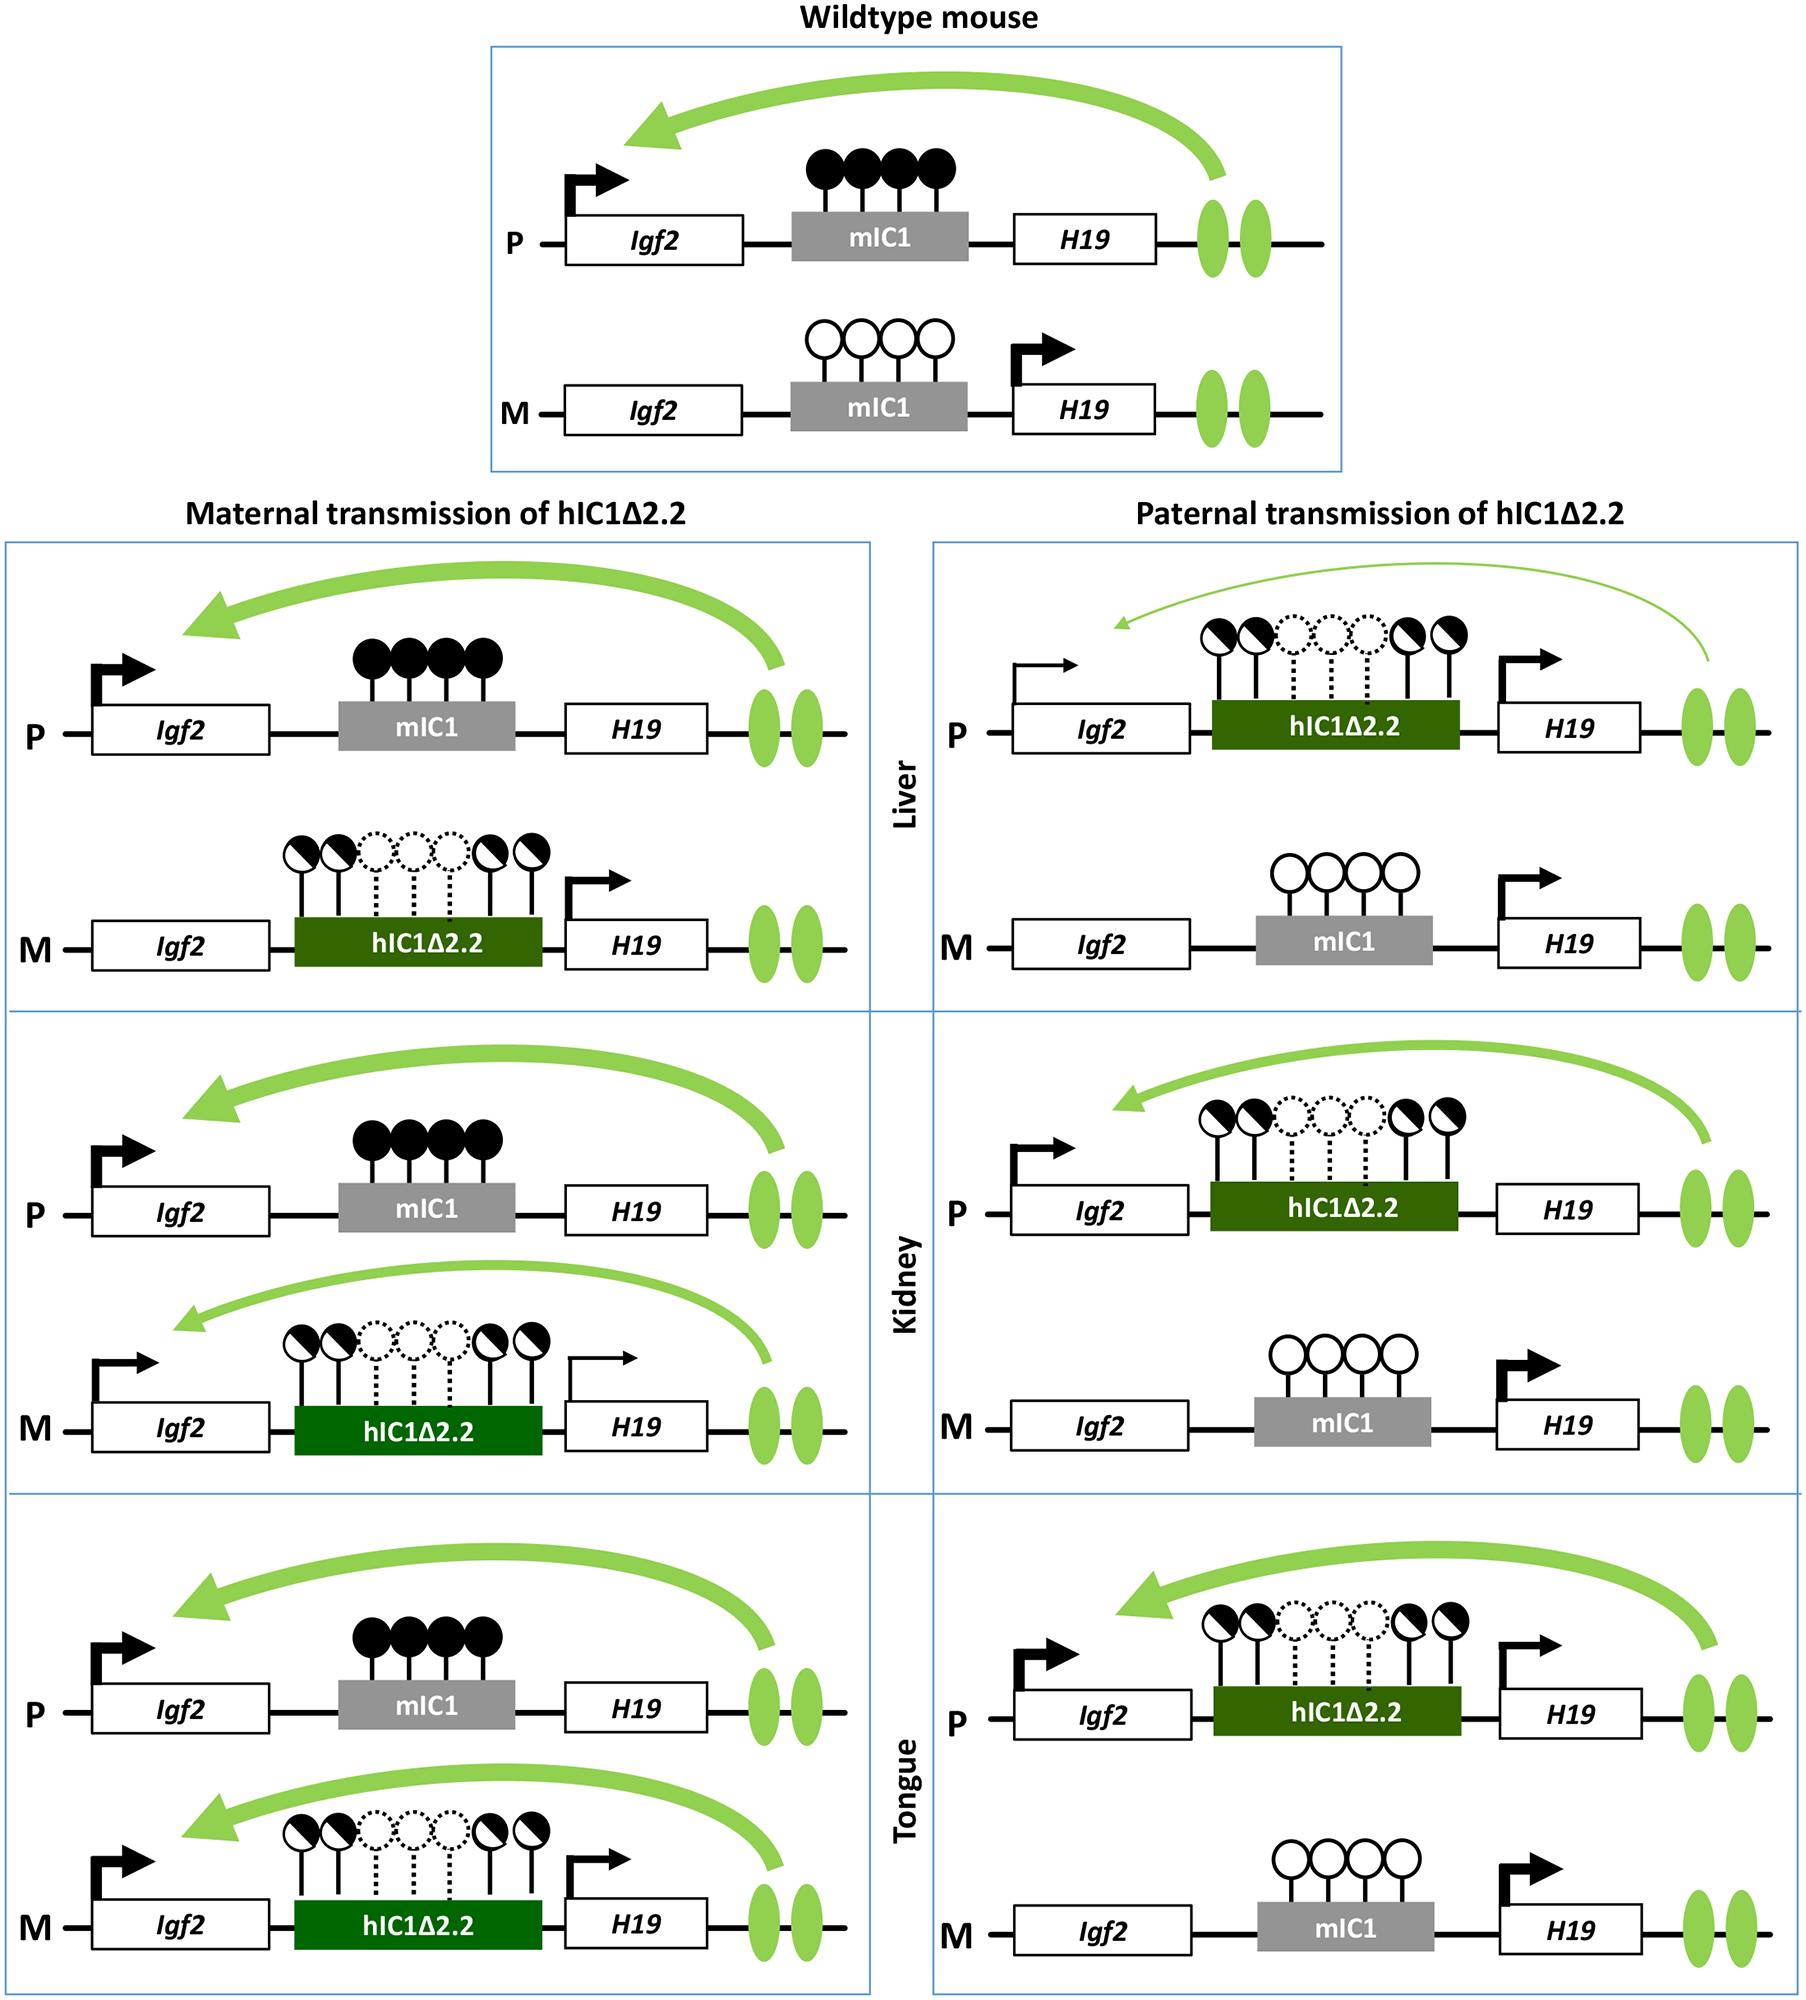 Diagram summarizing the tissue-specific imprinting defects of the <i>H19</i><sup><i>hIC1</i>Δ<i>2</i>.<i>2</i></sup> mice.